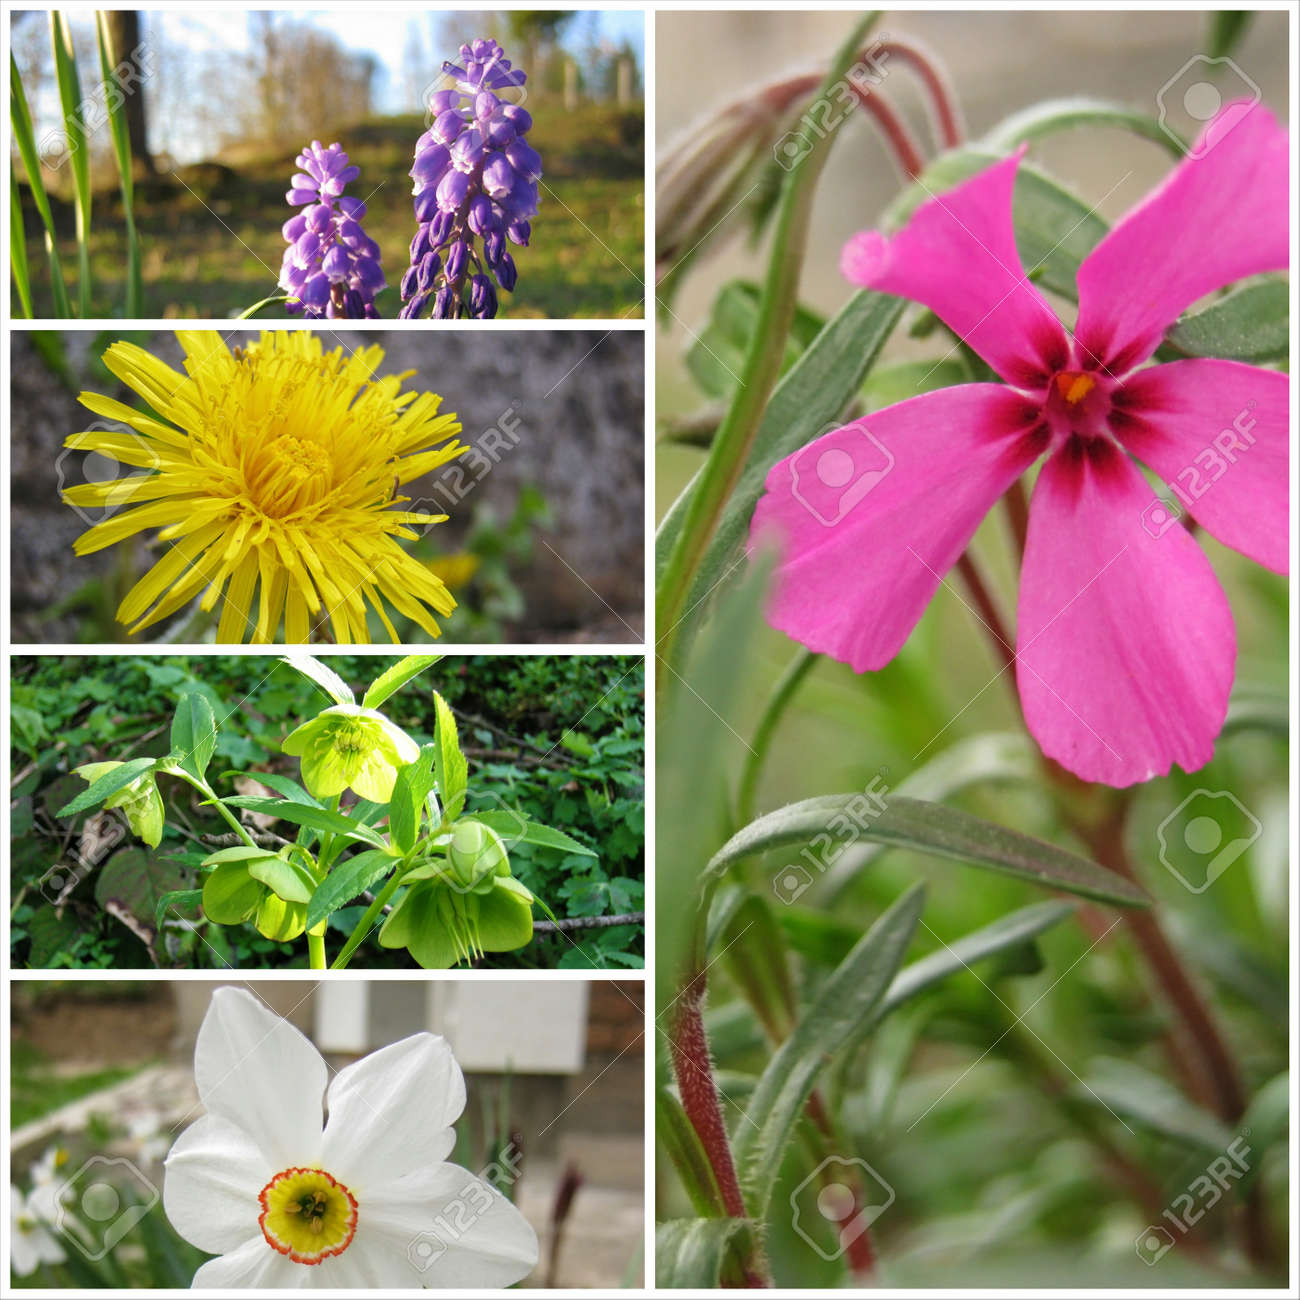 Group of beautifull flowers at spring season stock photo picture group of beautifull flowers at spring season stock photo 20598341 mightylinksfo